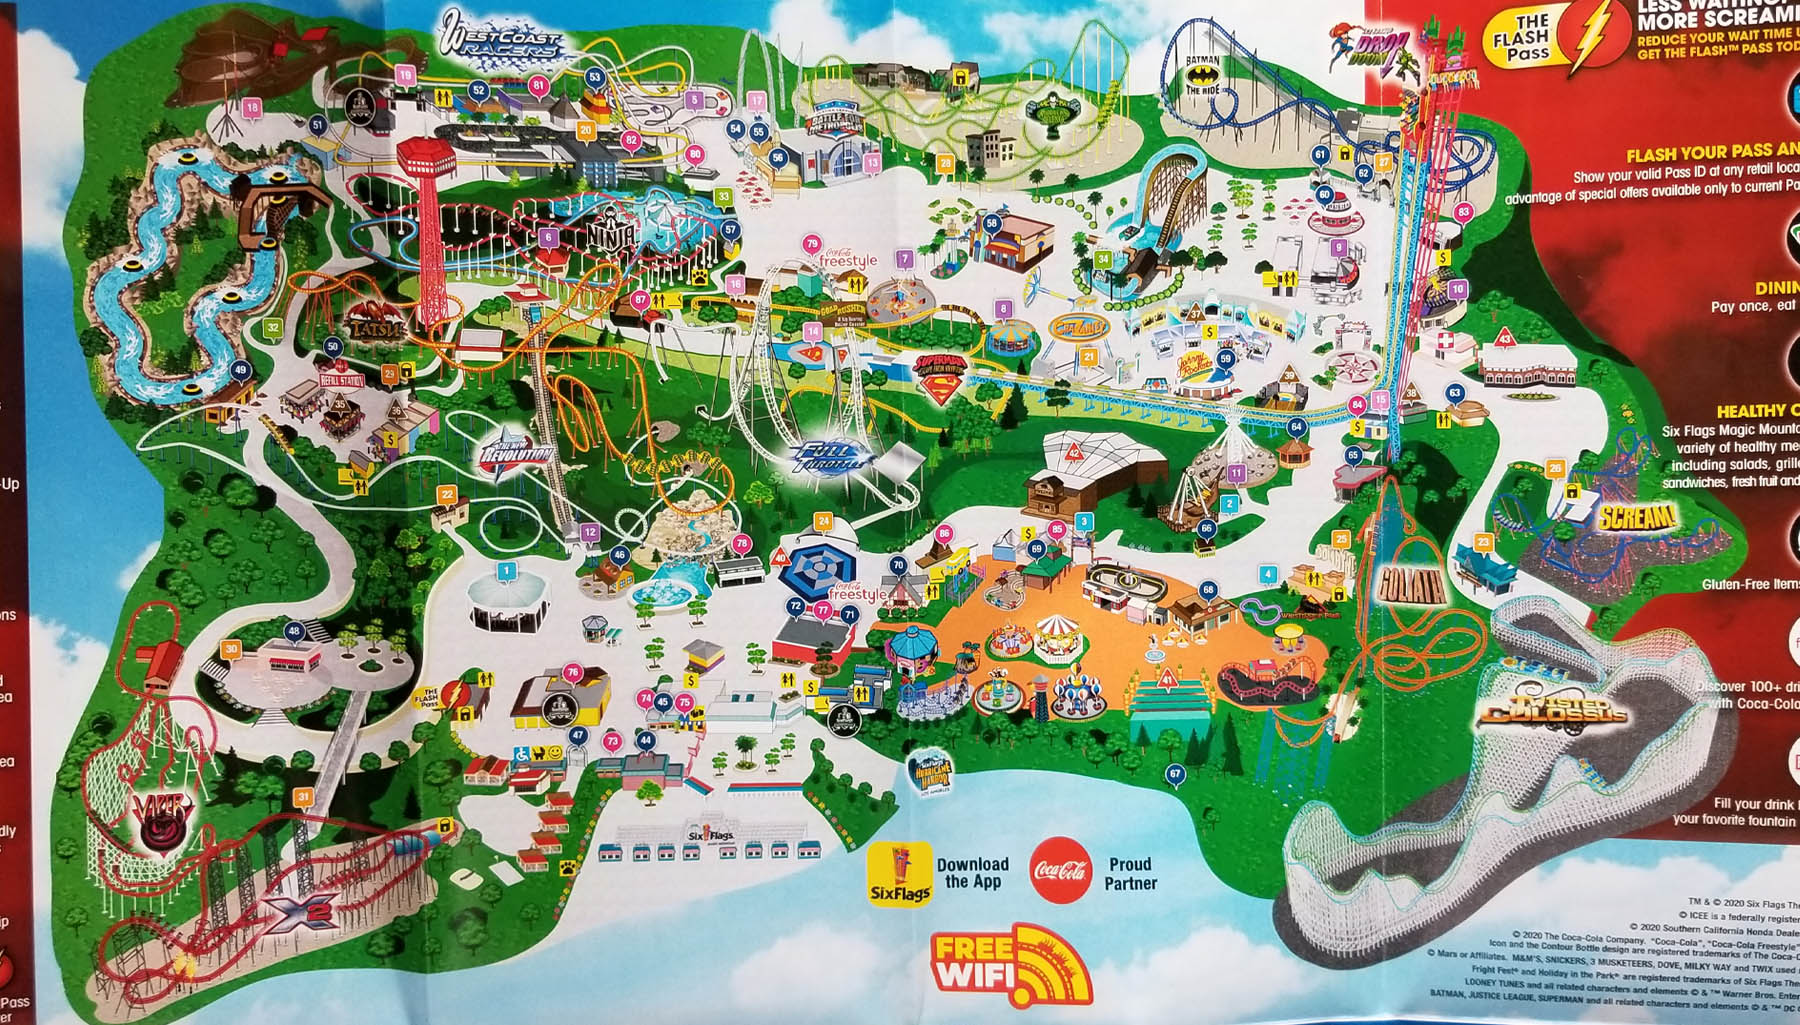 2020 Six Flags Magic Mountain map